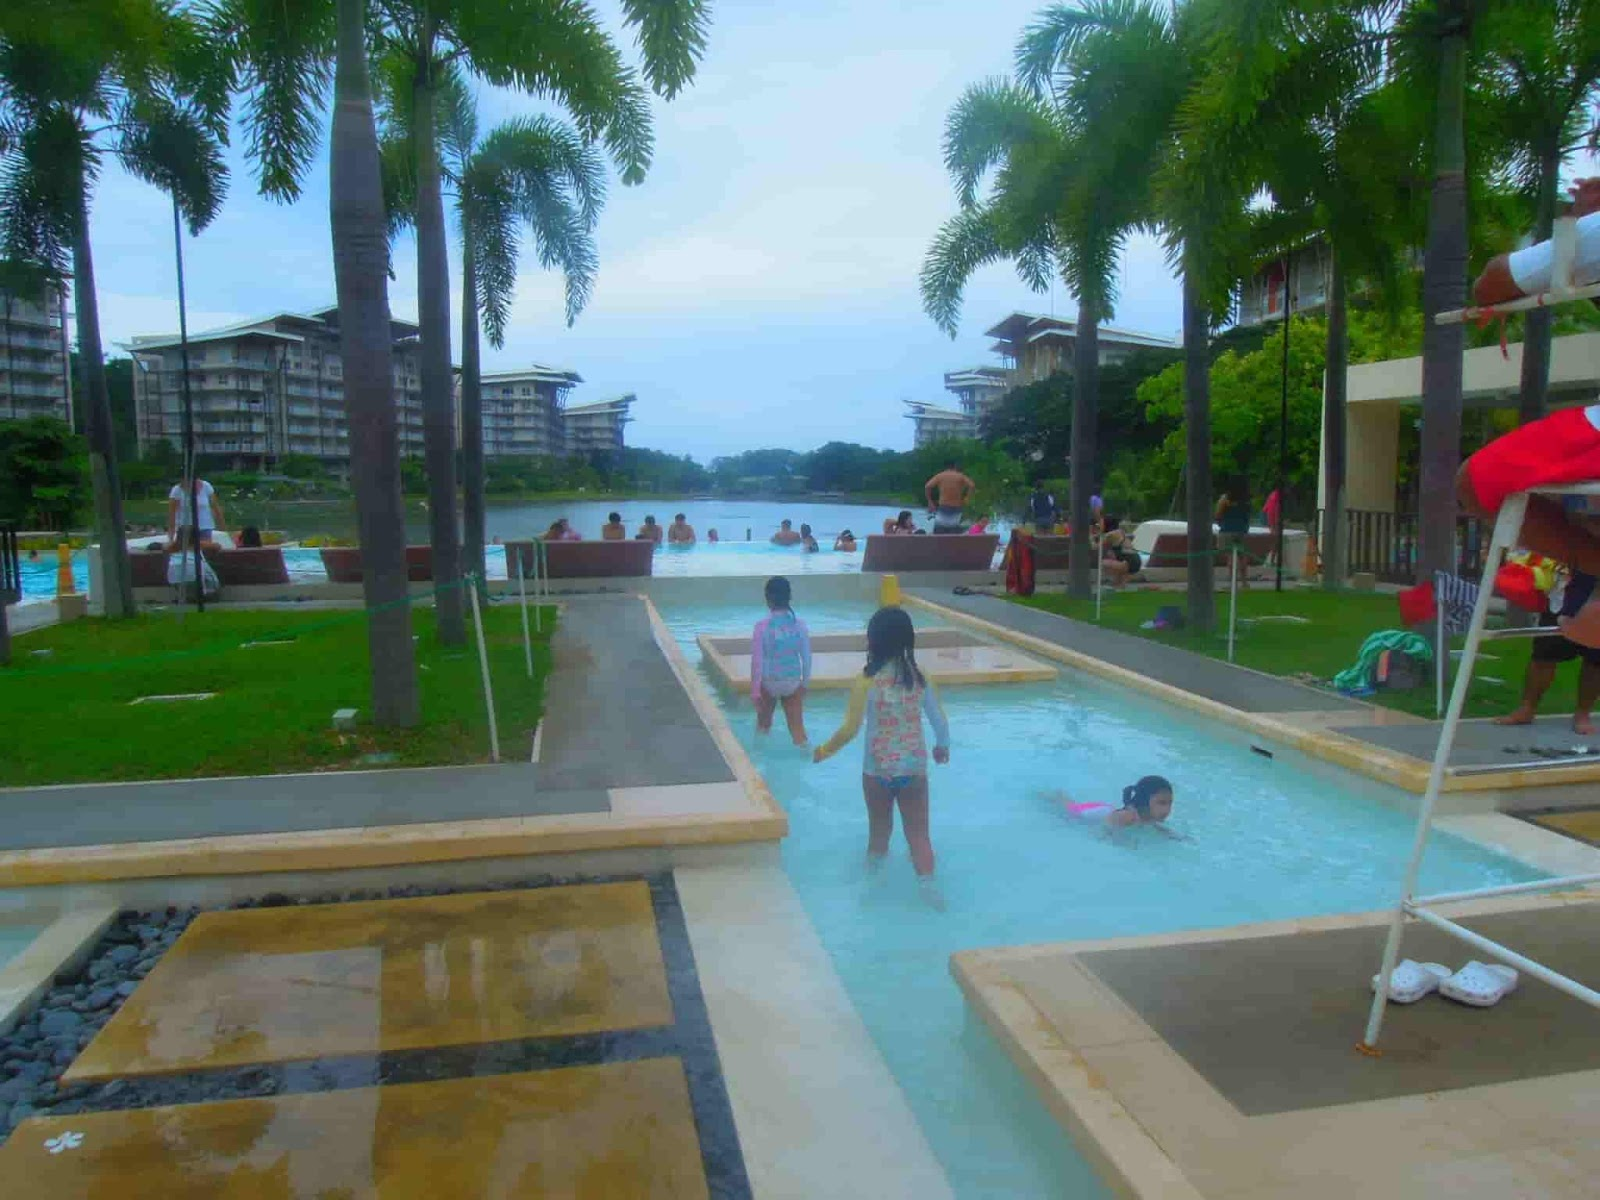 Children's pool at the Pico de Loro Beach & Country Club